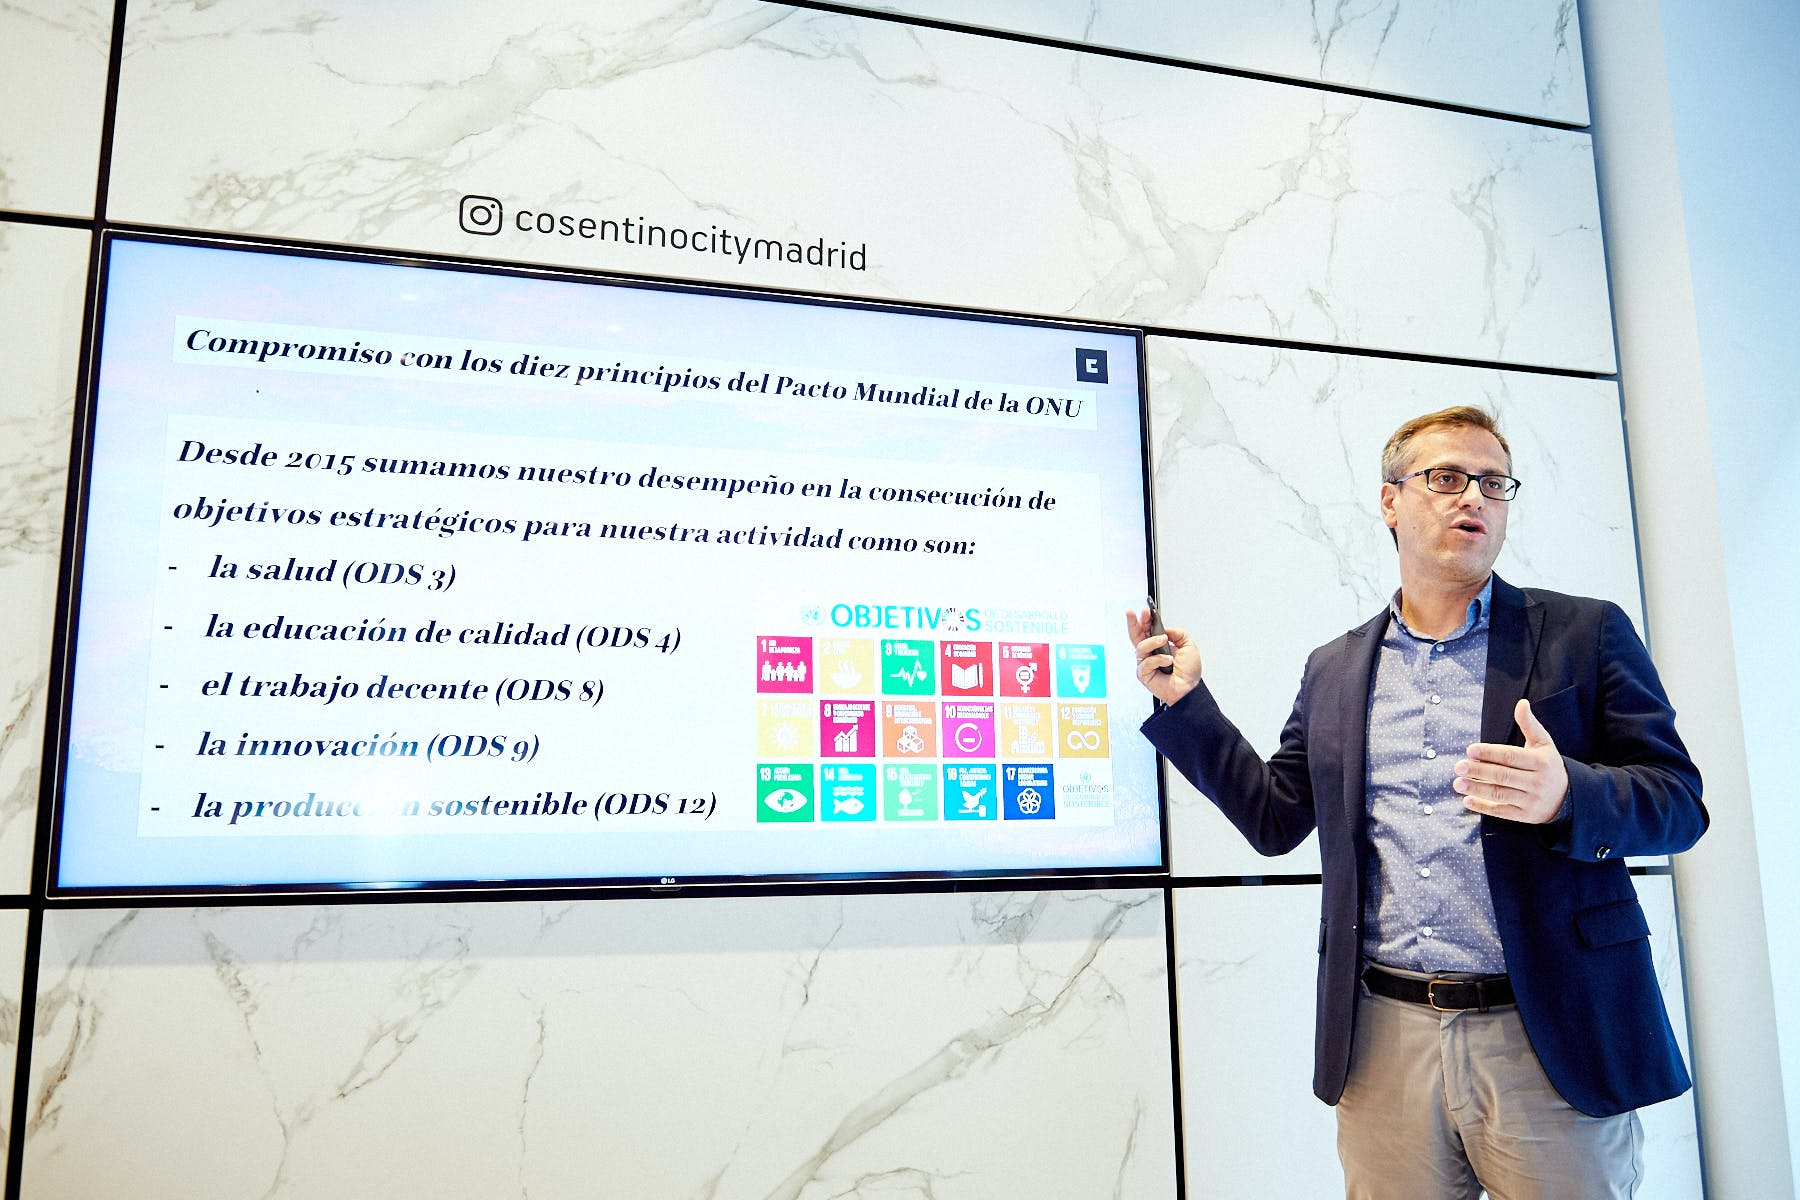 Image of Antonio Urdiales Cosentino City Madrid 1 in Cosentino talks about the future of Purchasing - Cosentino